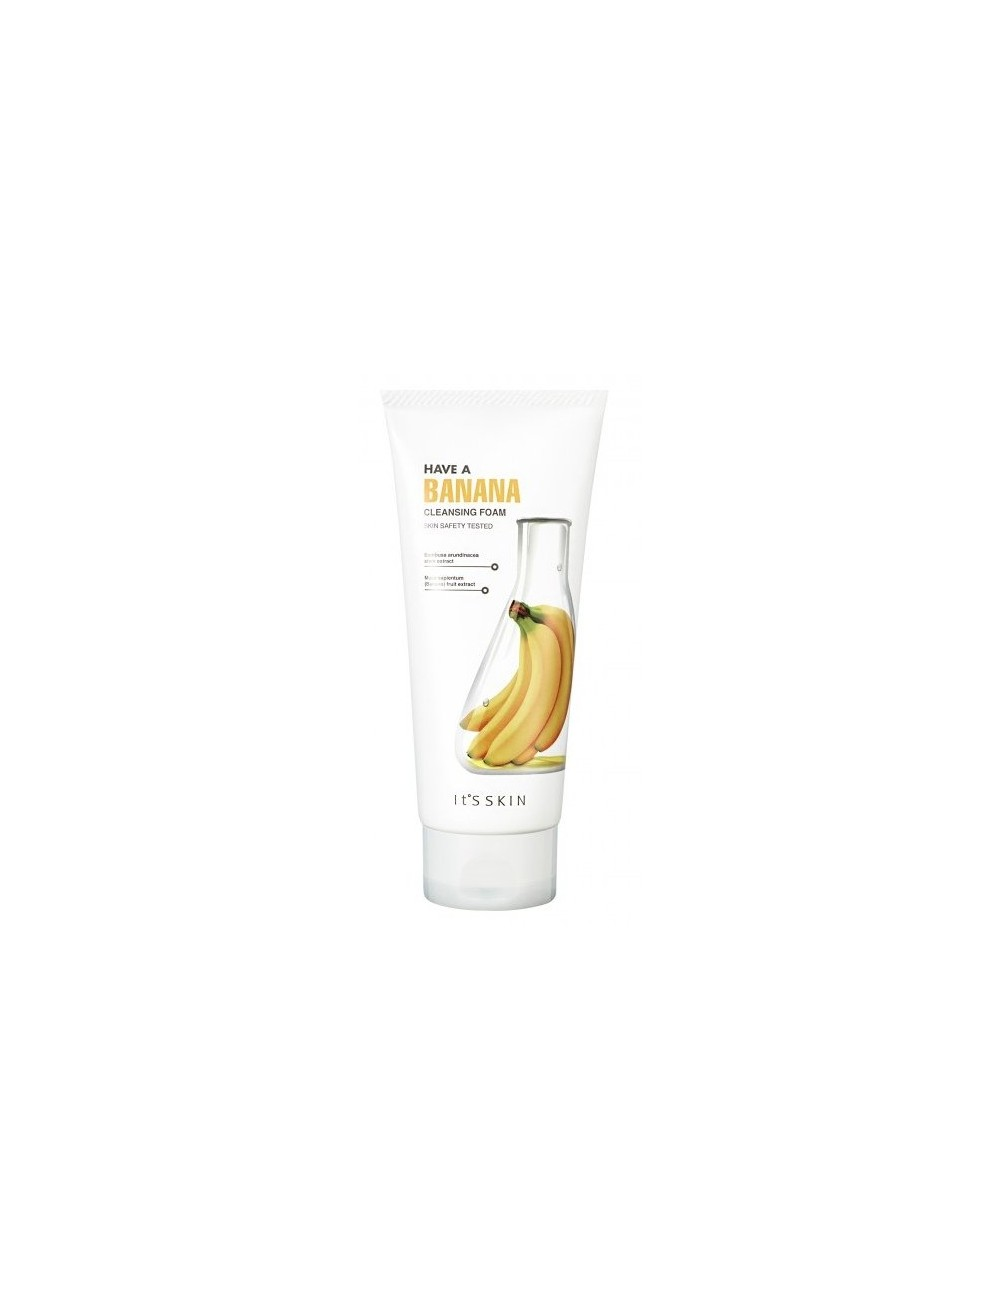 Espuma Limpiadora e Hidratante IT'S SKIN Have a Banana Cleansing Foam